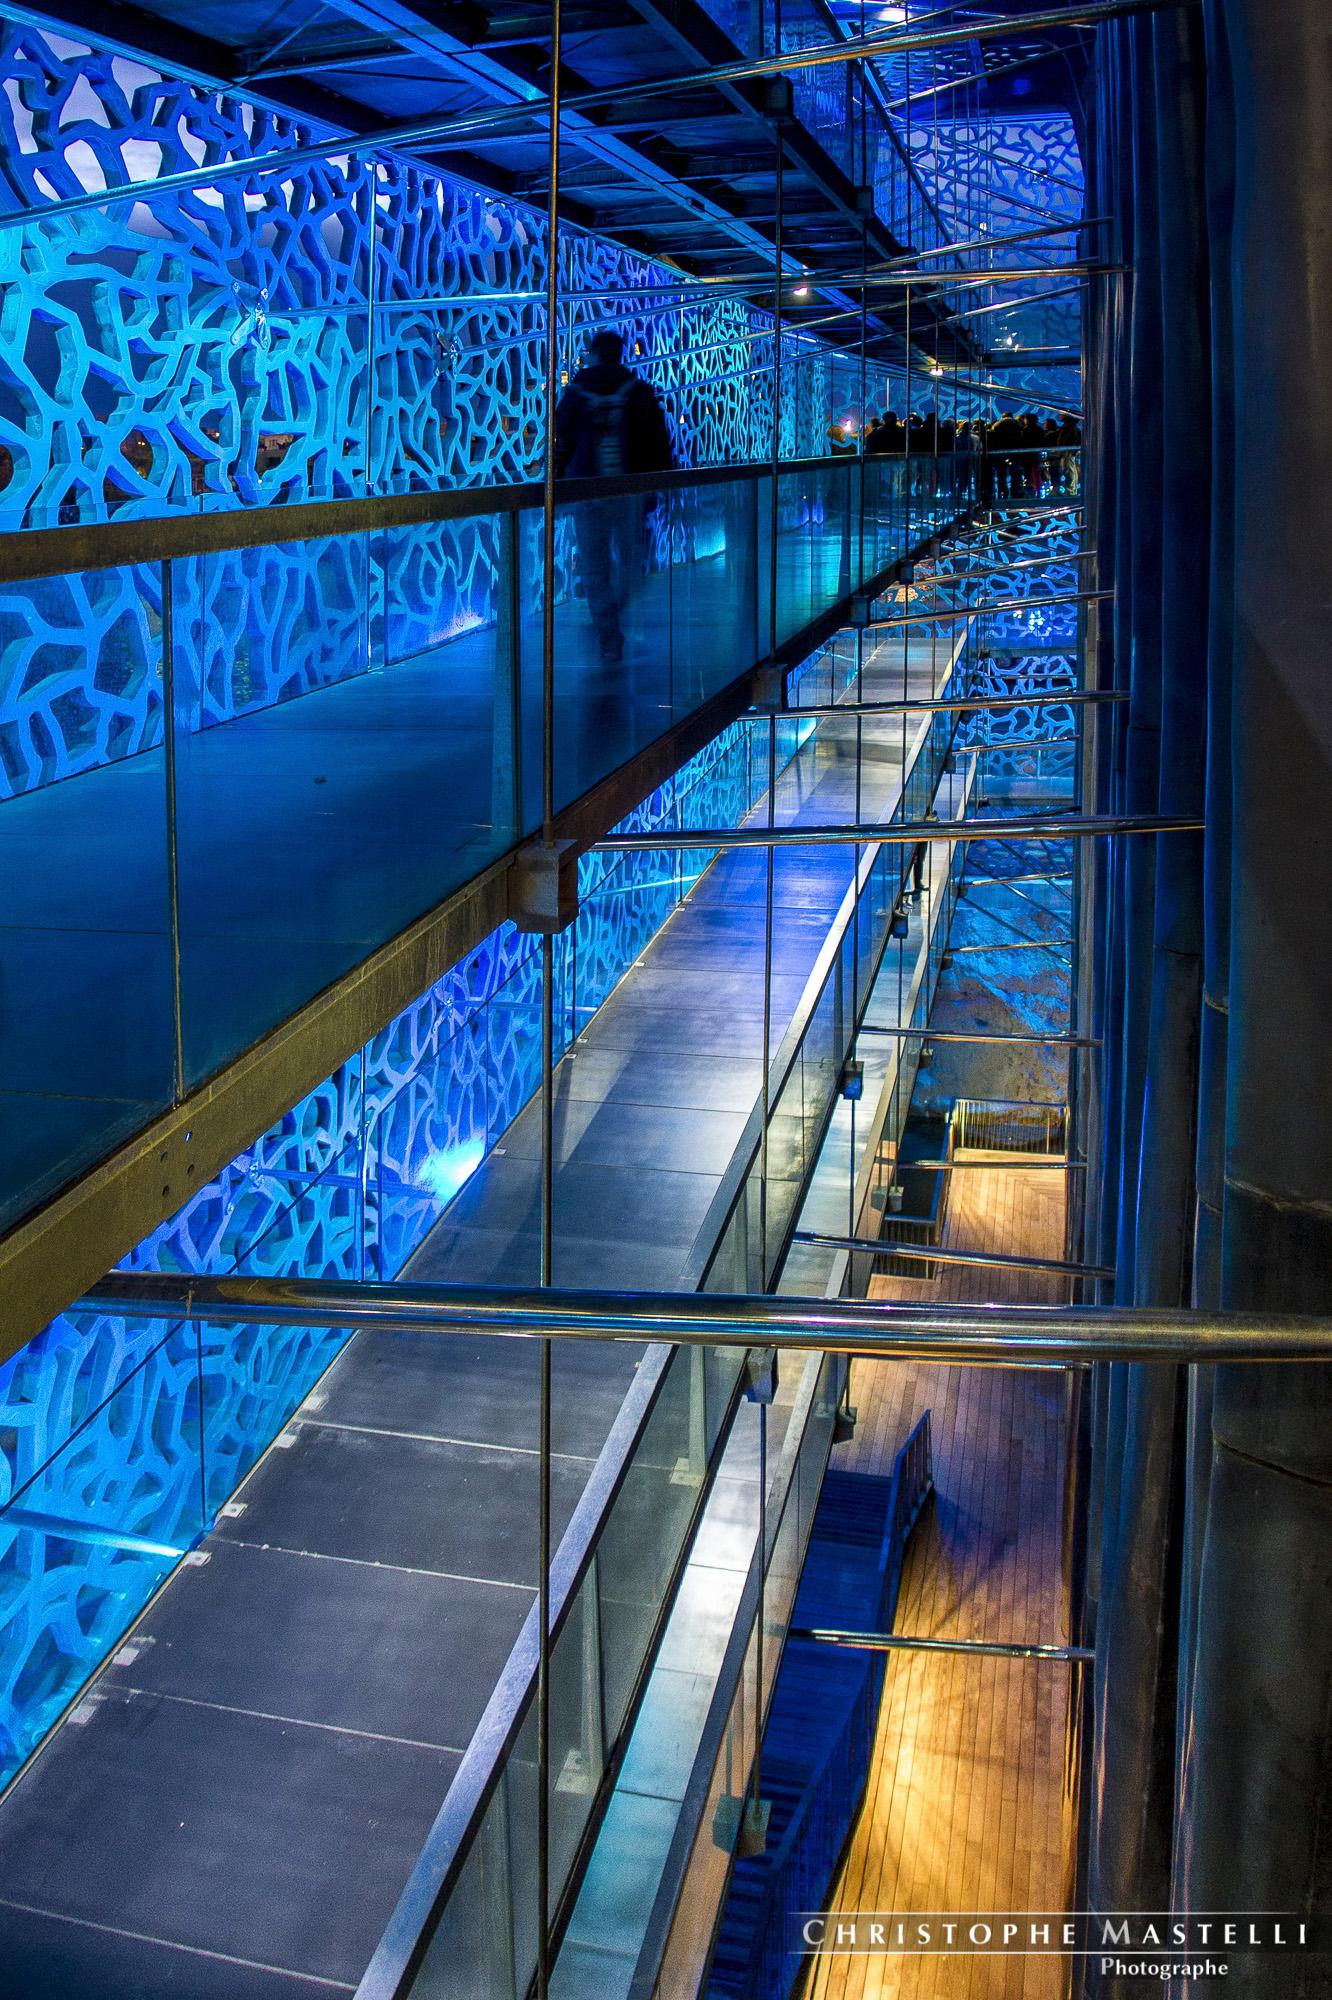 architecture_001-christophe-marseille-mastelli-photographe